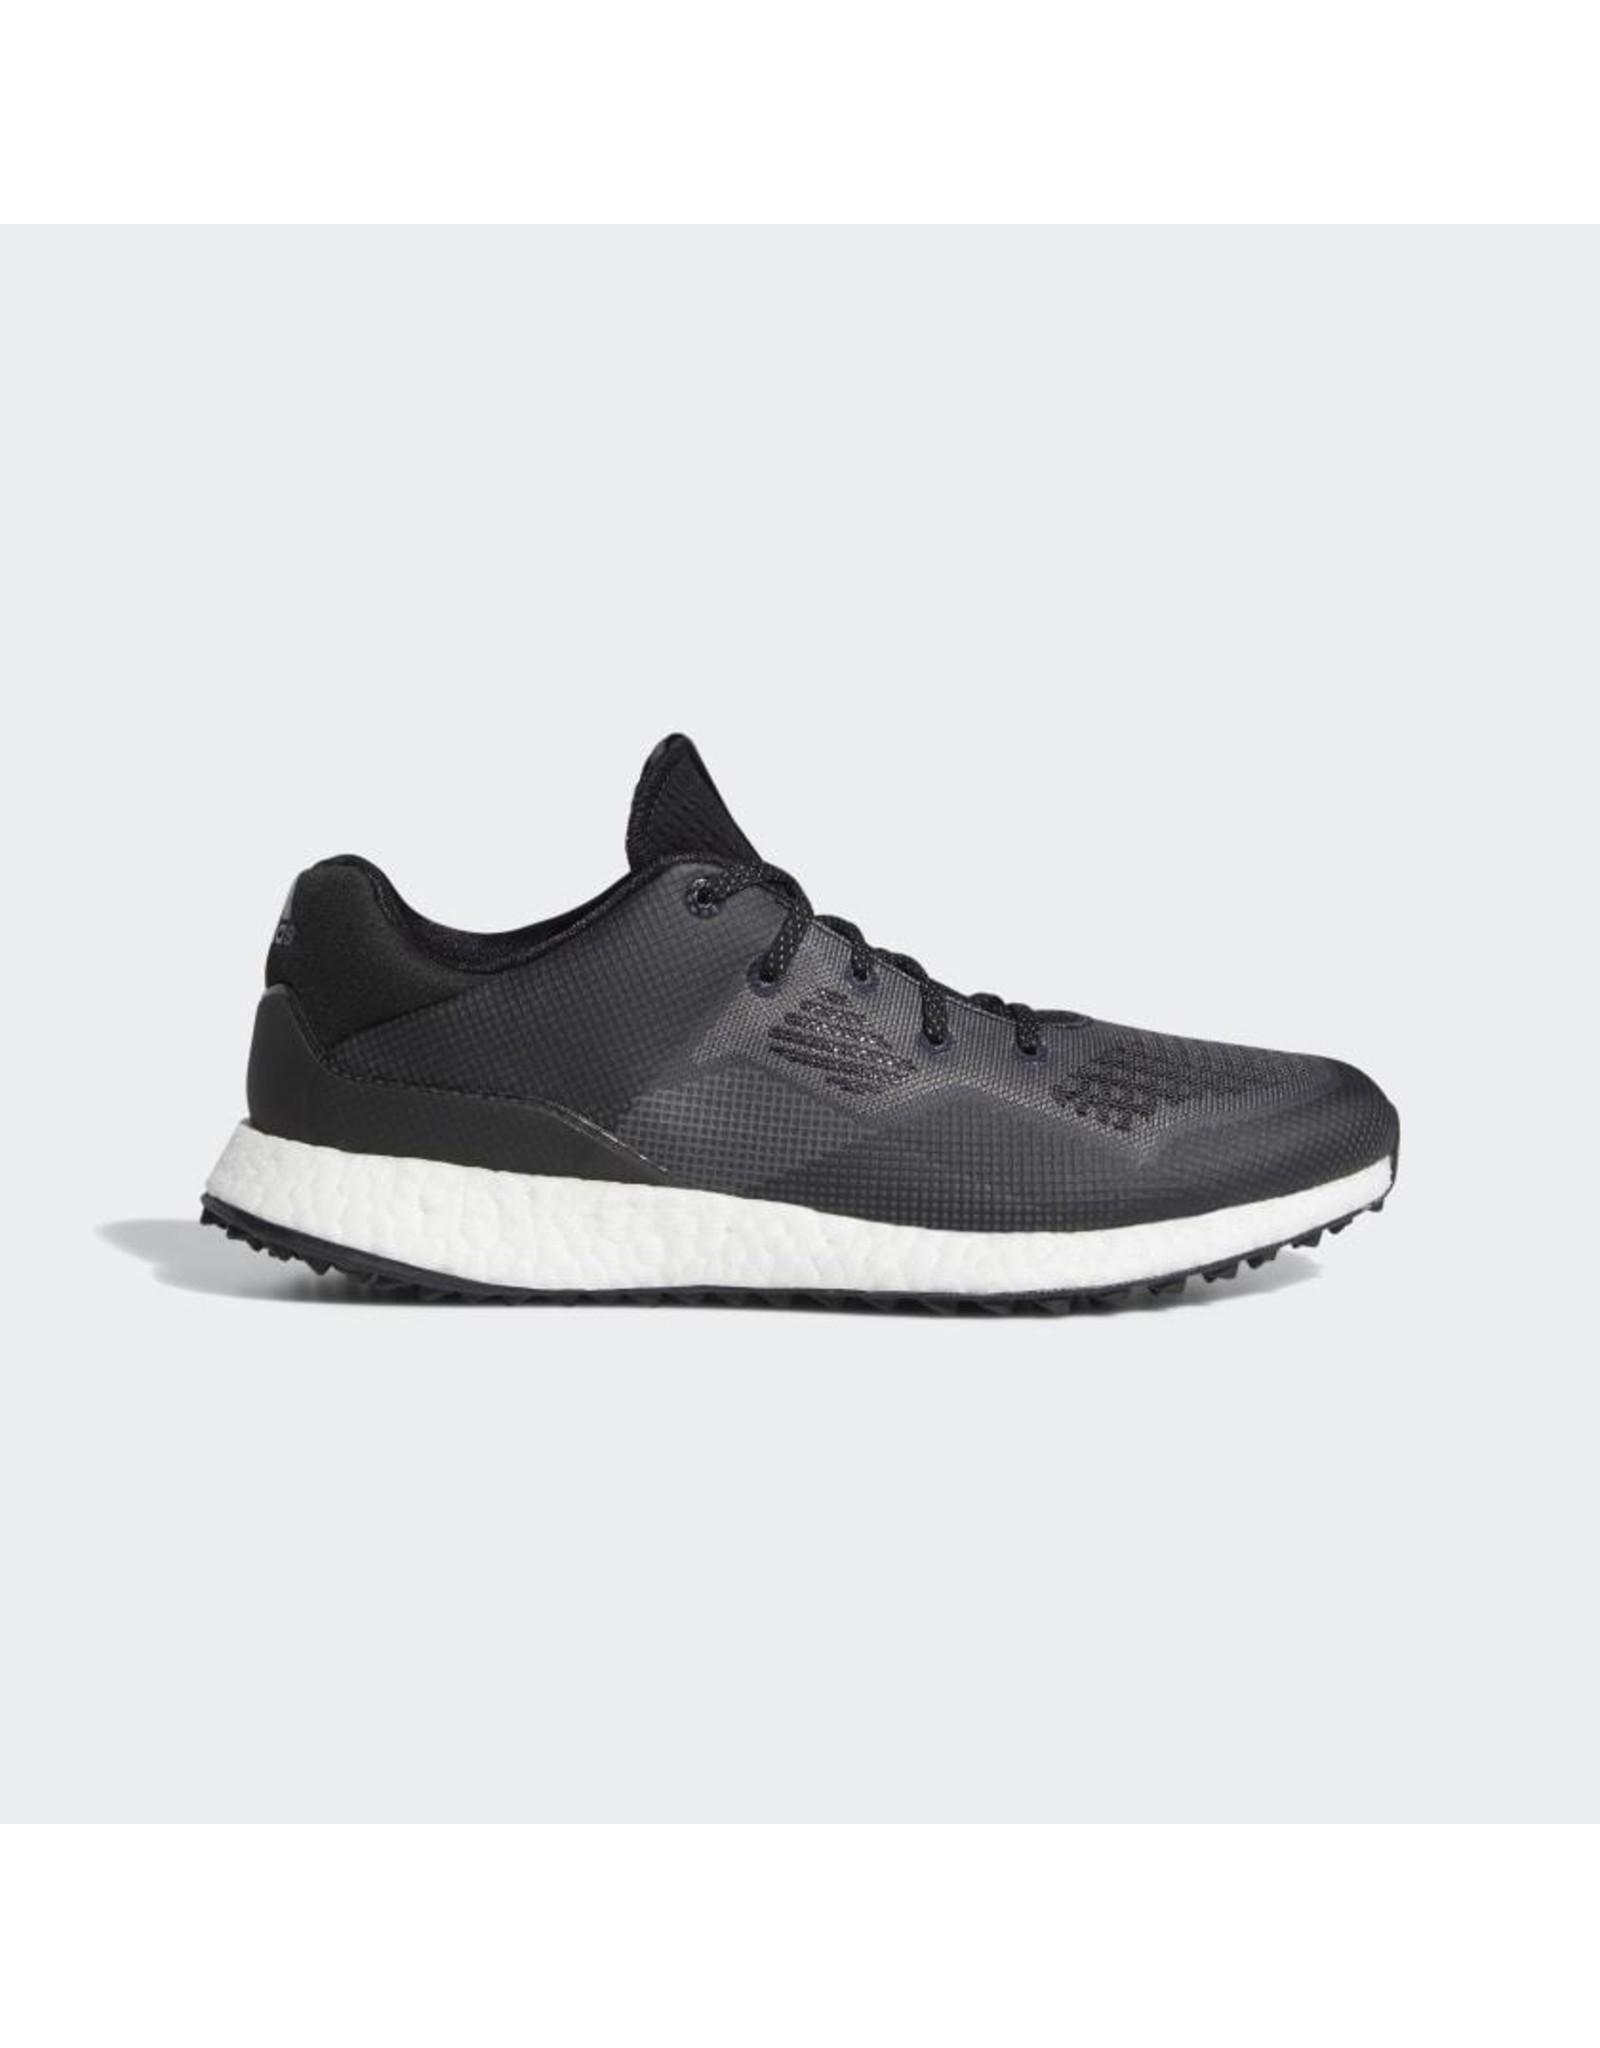 Adidas Adidas Crossknit DPR Black